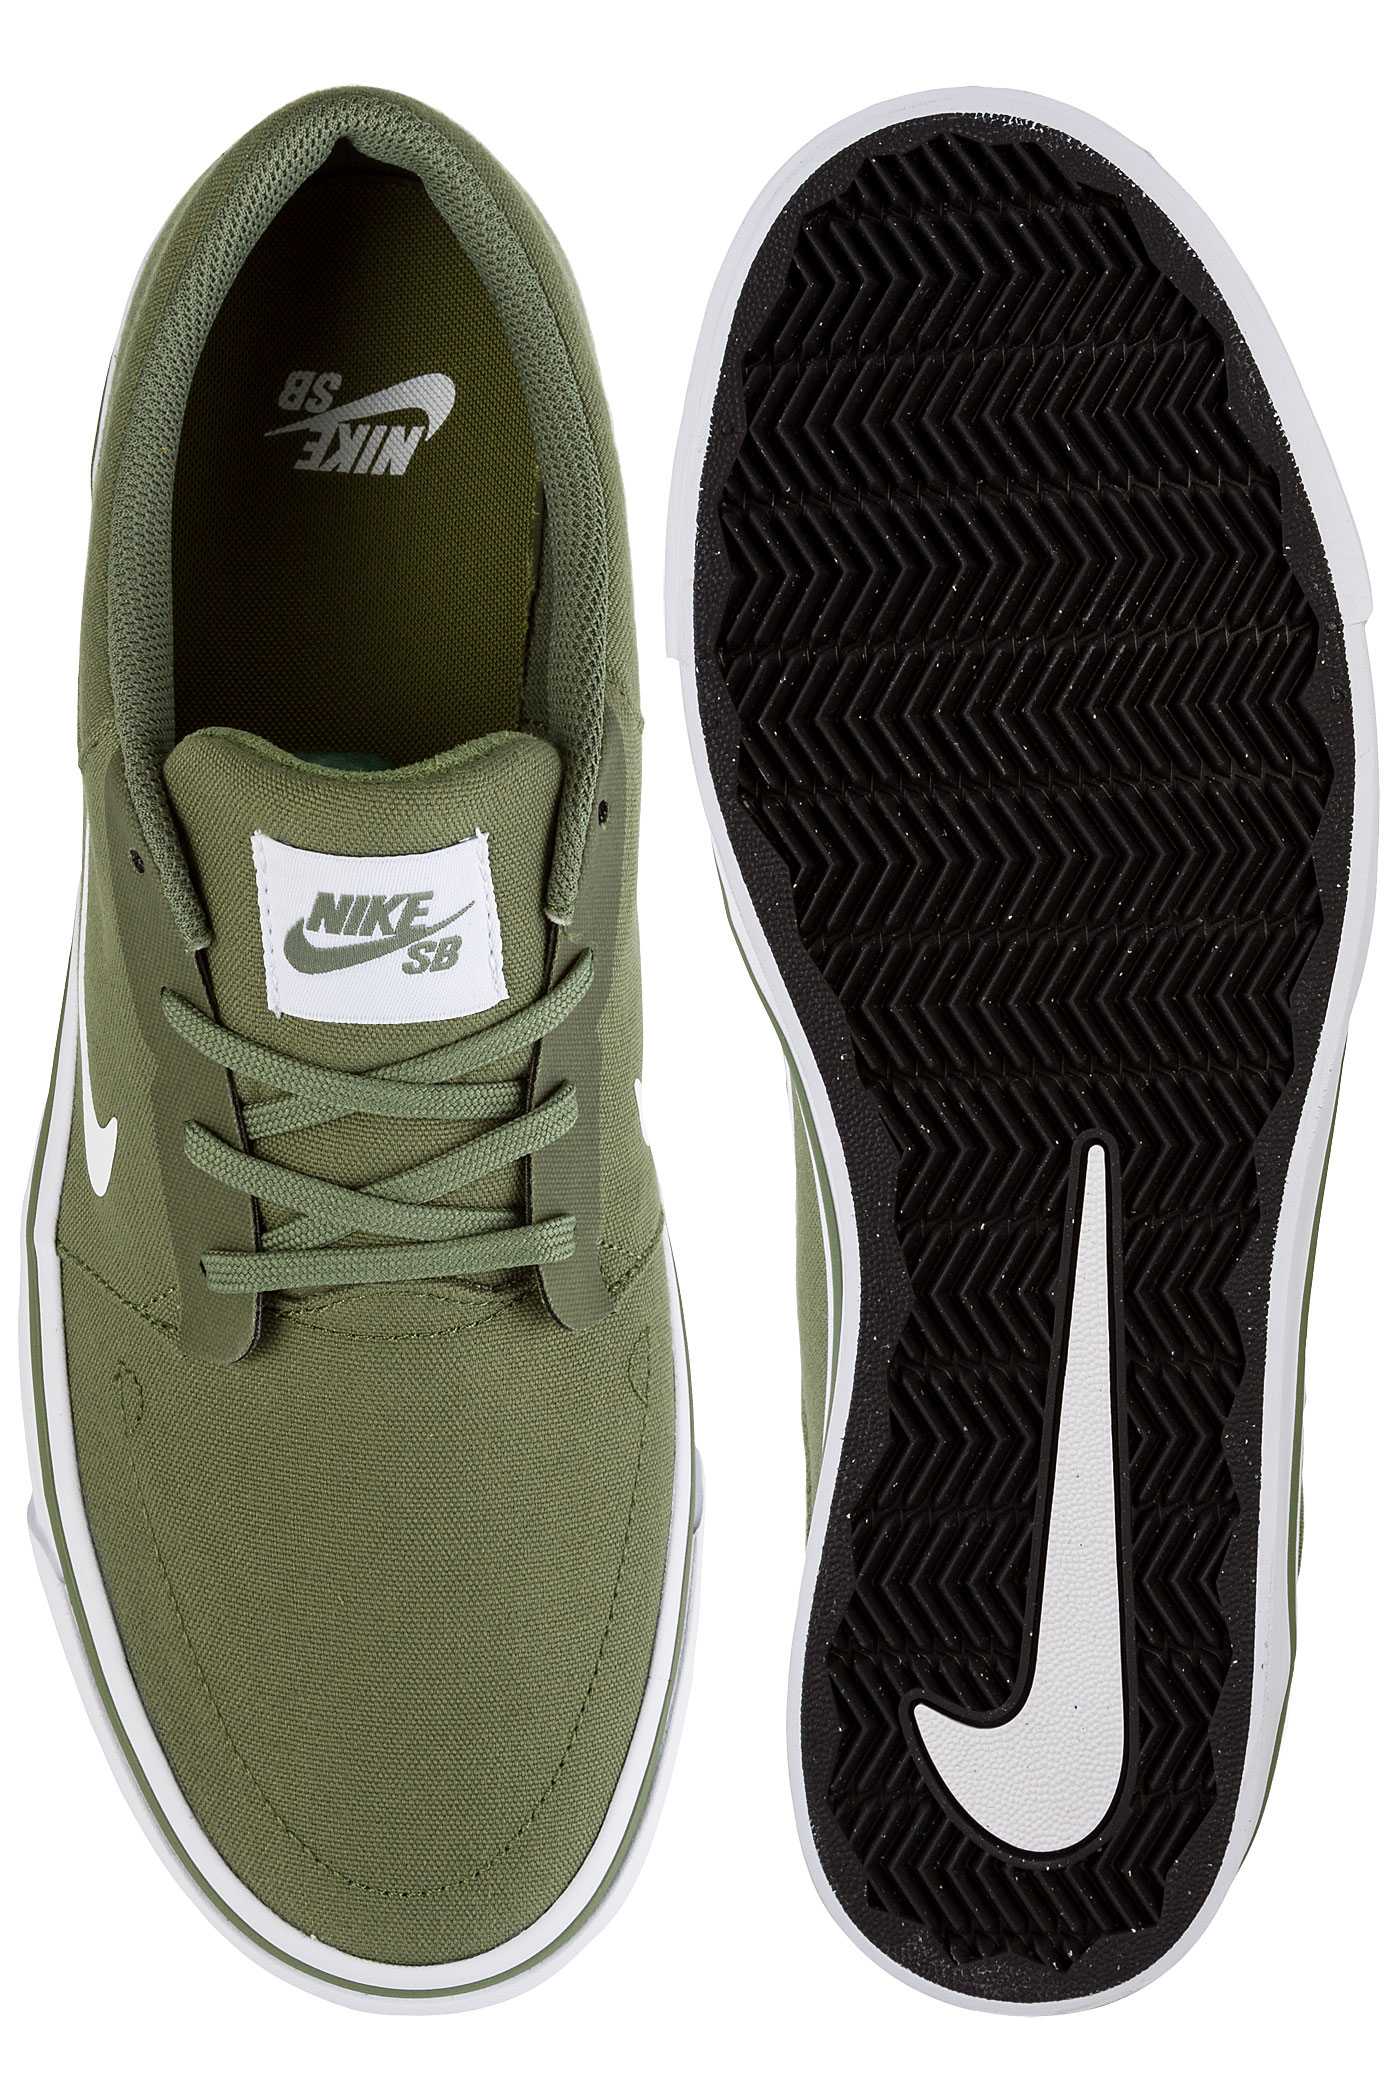 new photos 52e6b 288ee ... Nike SB Portmore Canvas Shoes (palm green white) ...